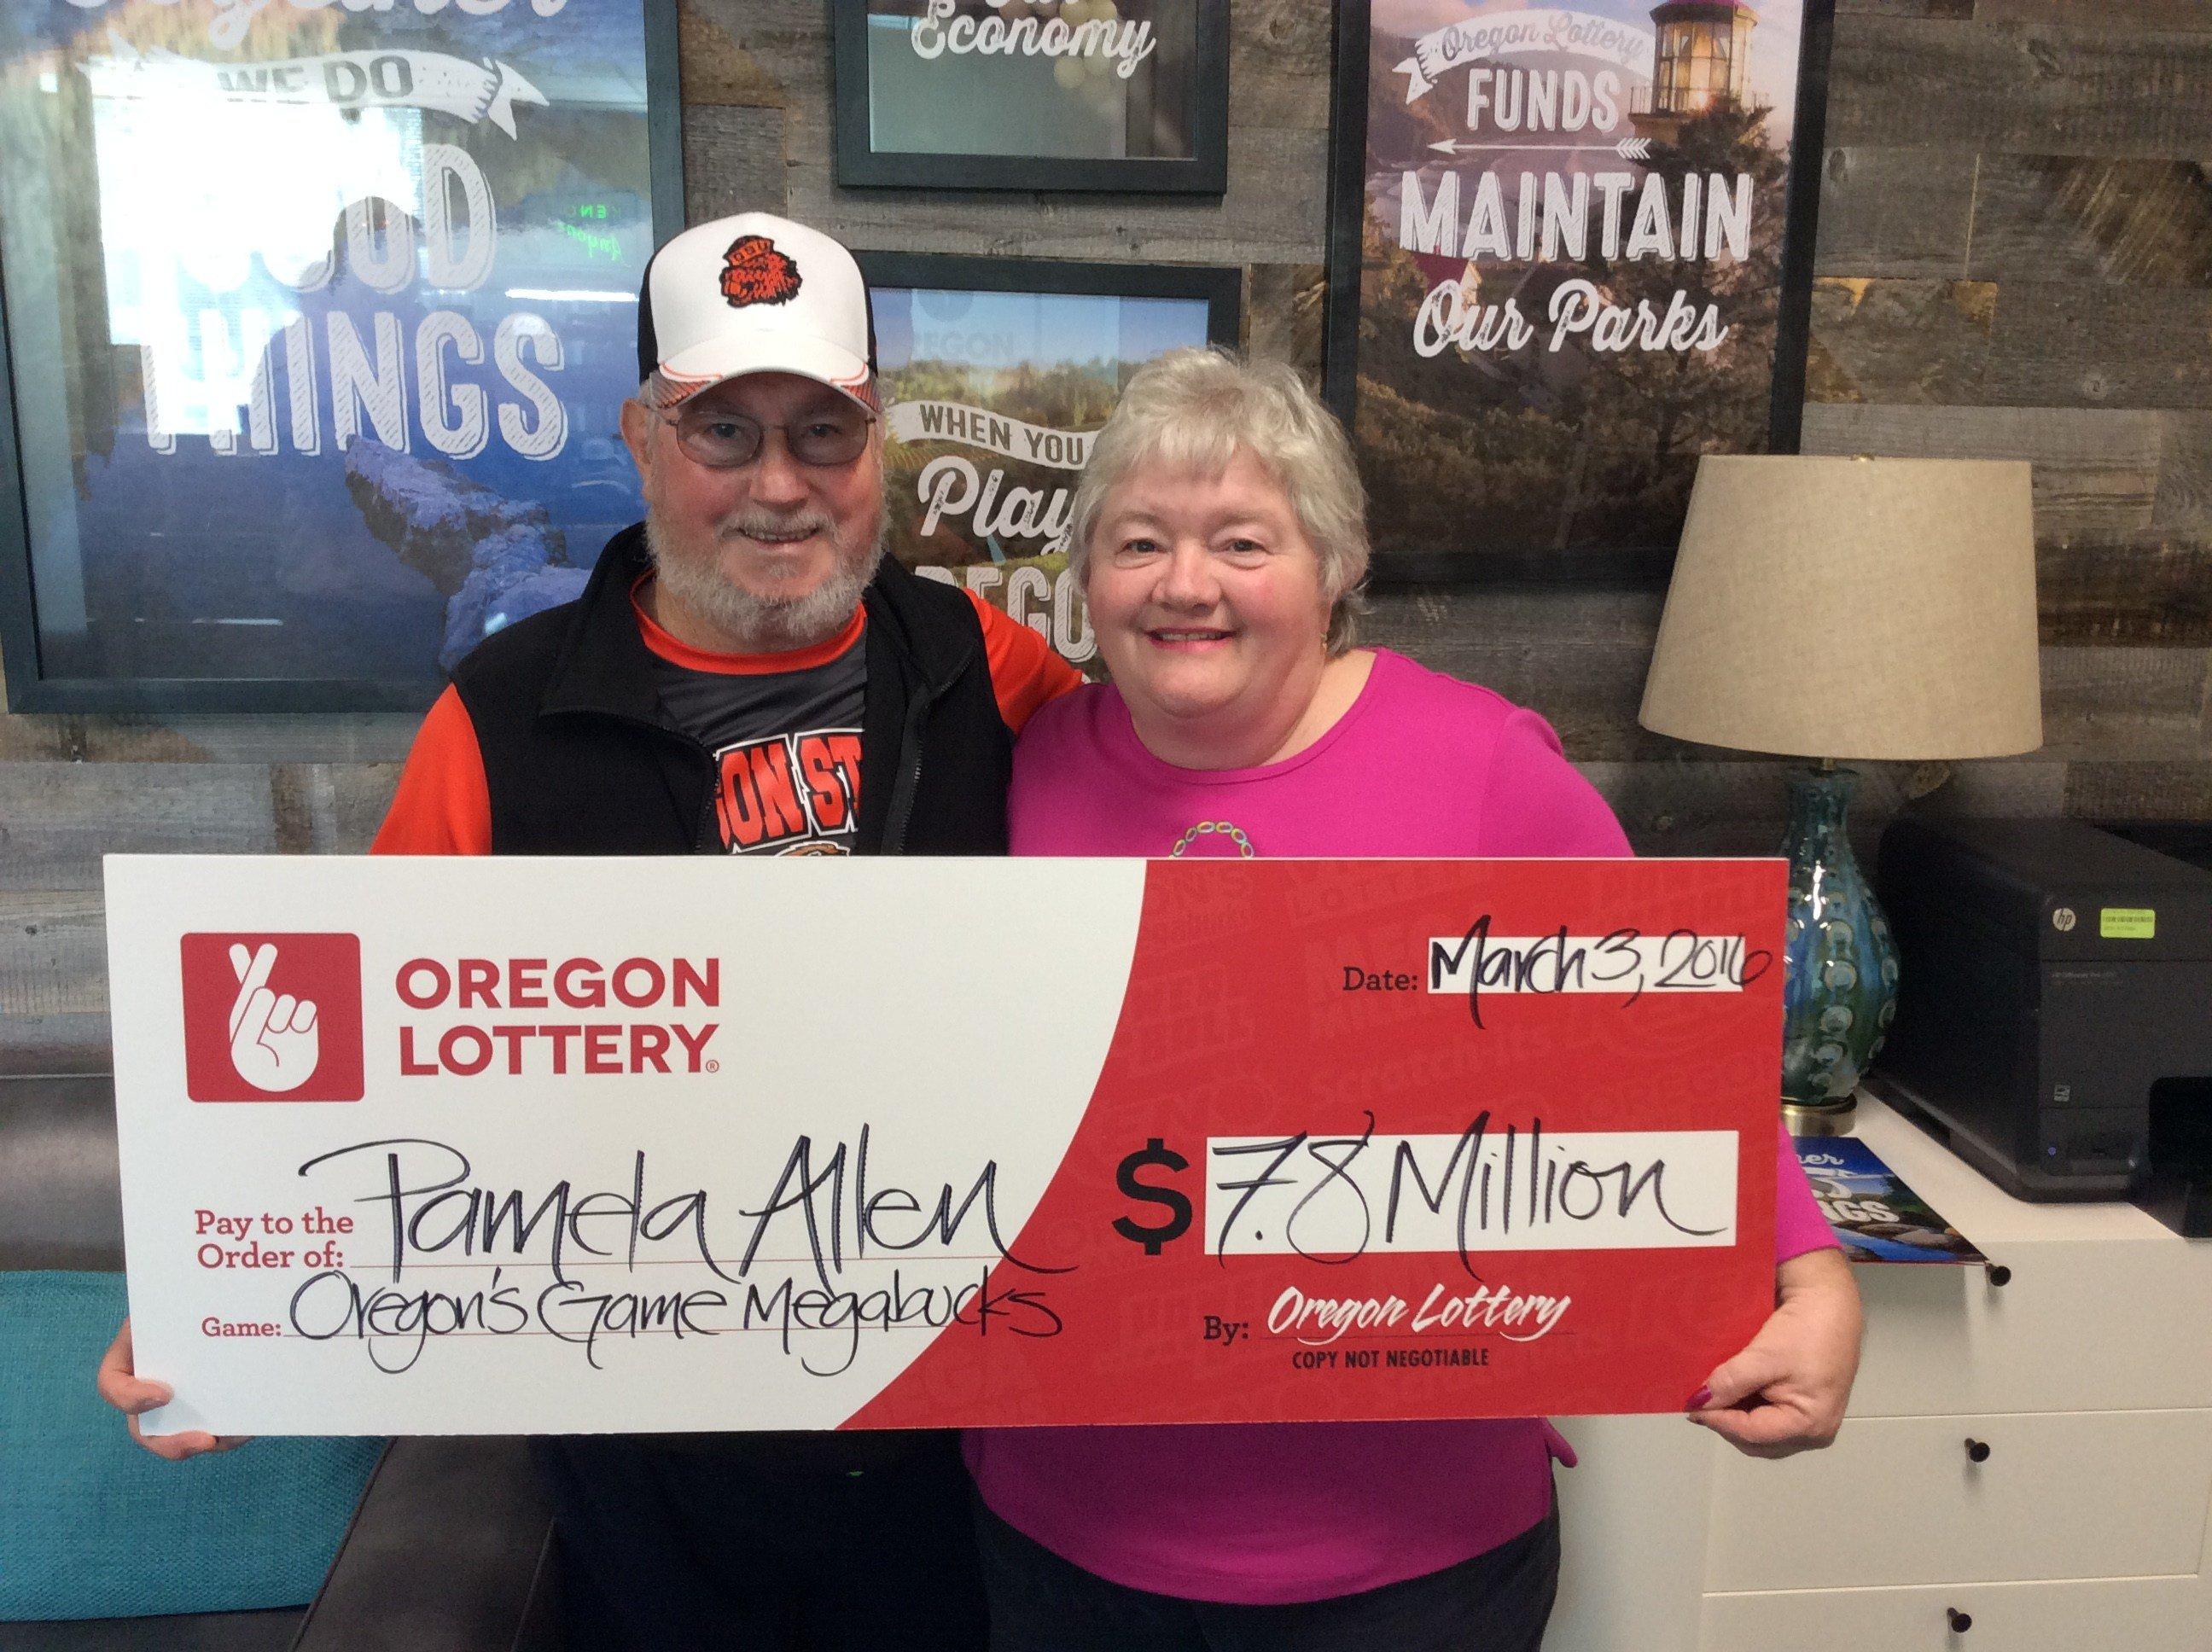 Pam and Curt Allen won $7.8 million playing Oregon's Game Megabucks (Courtesy: Oregon Lottery)